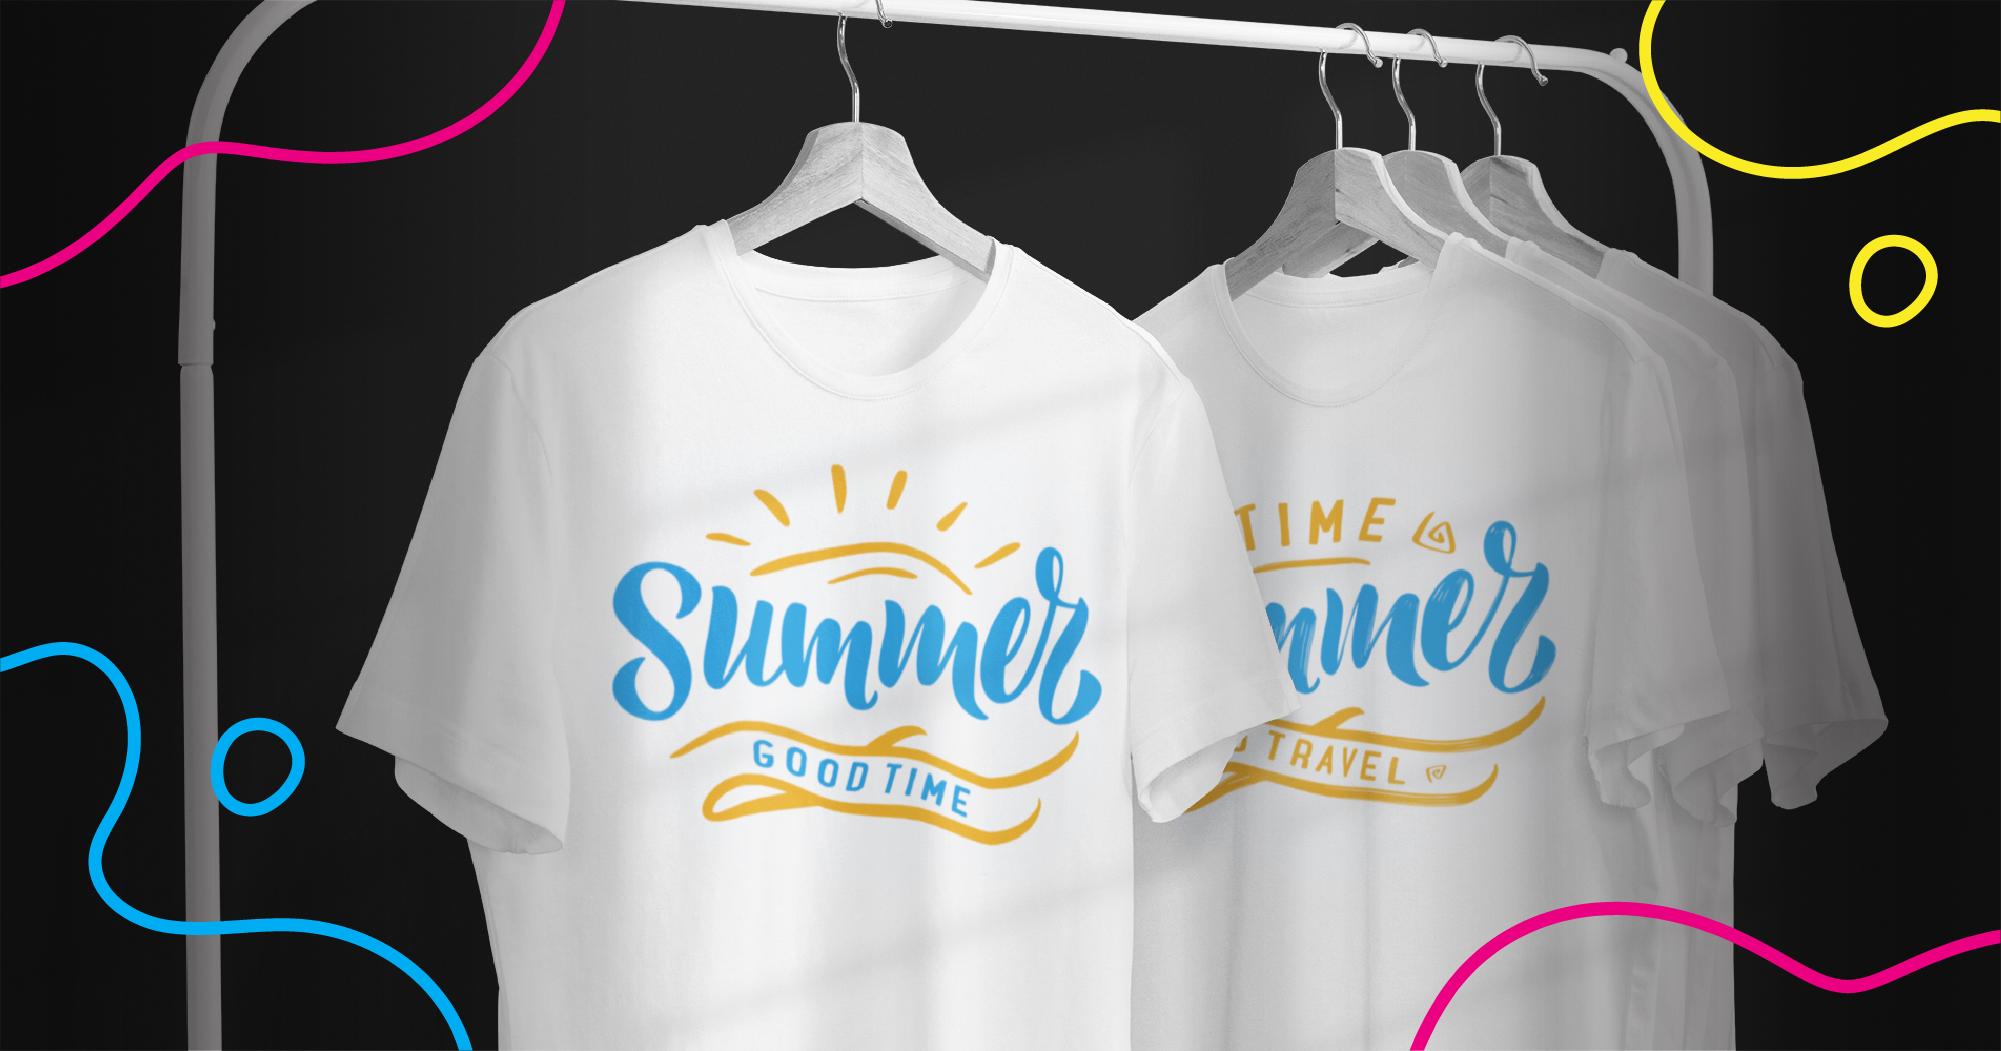 Custom shirts hanging on a rack made by print on demand companies.